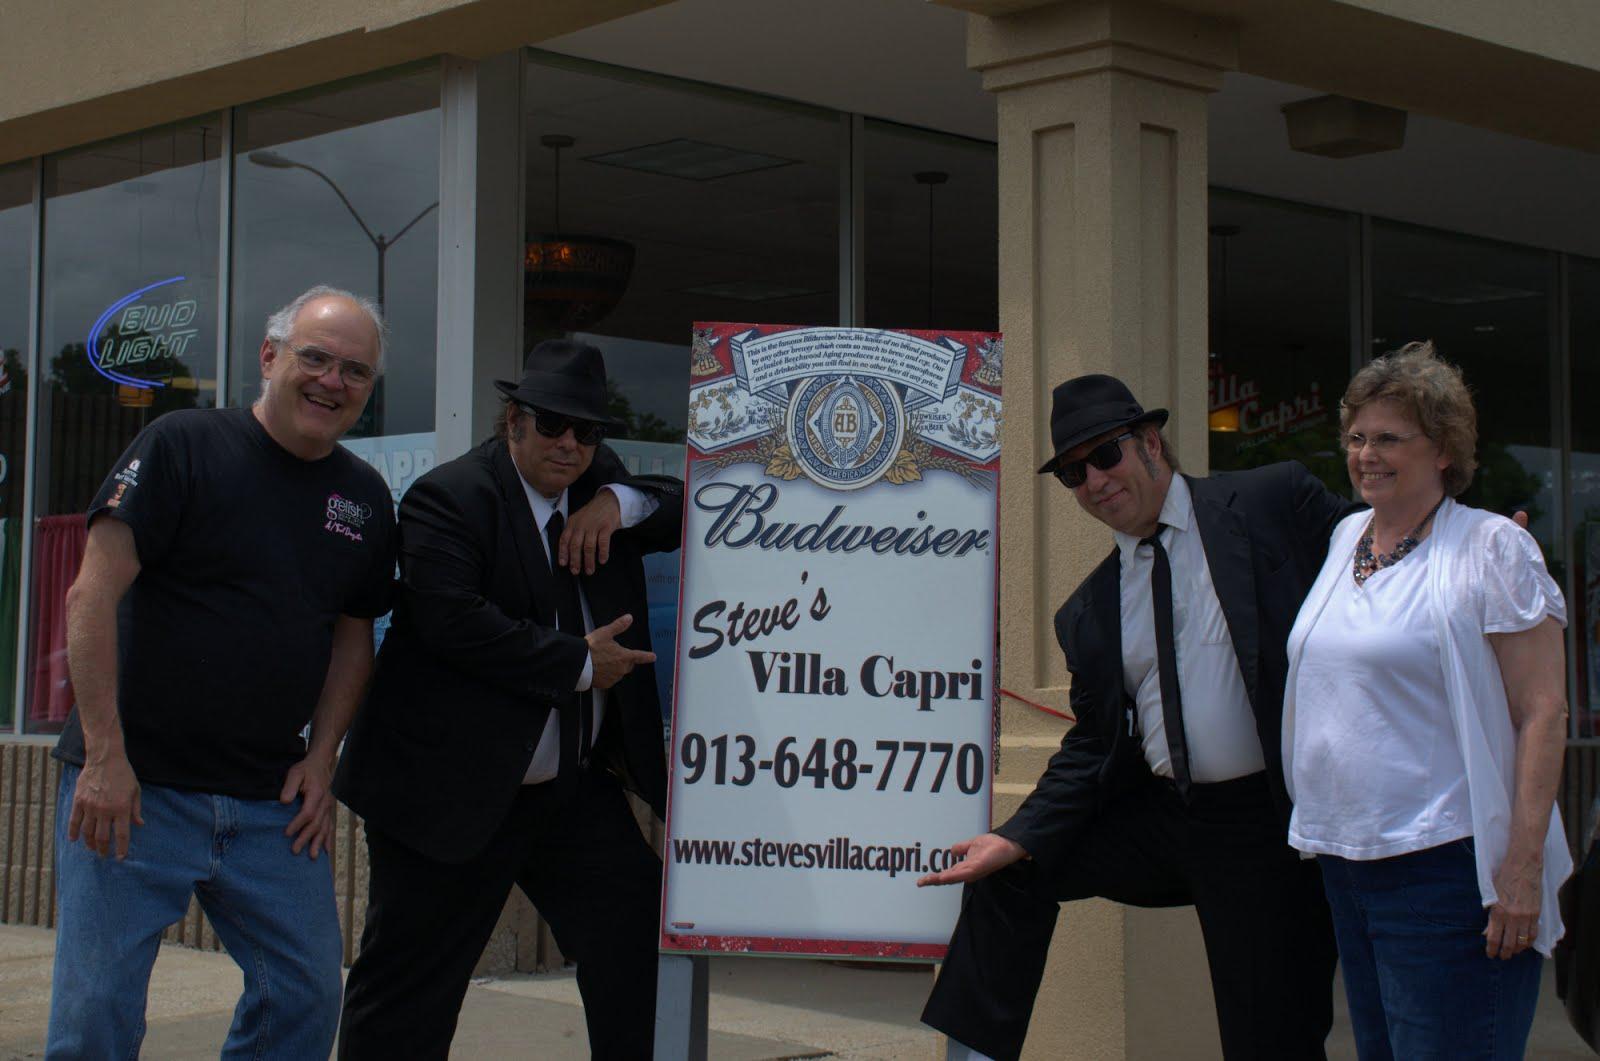 Steve's Villa Capri